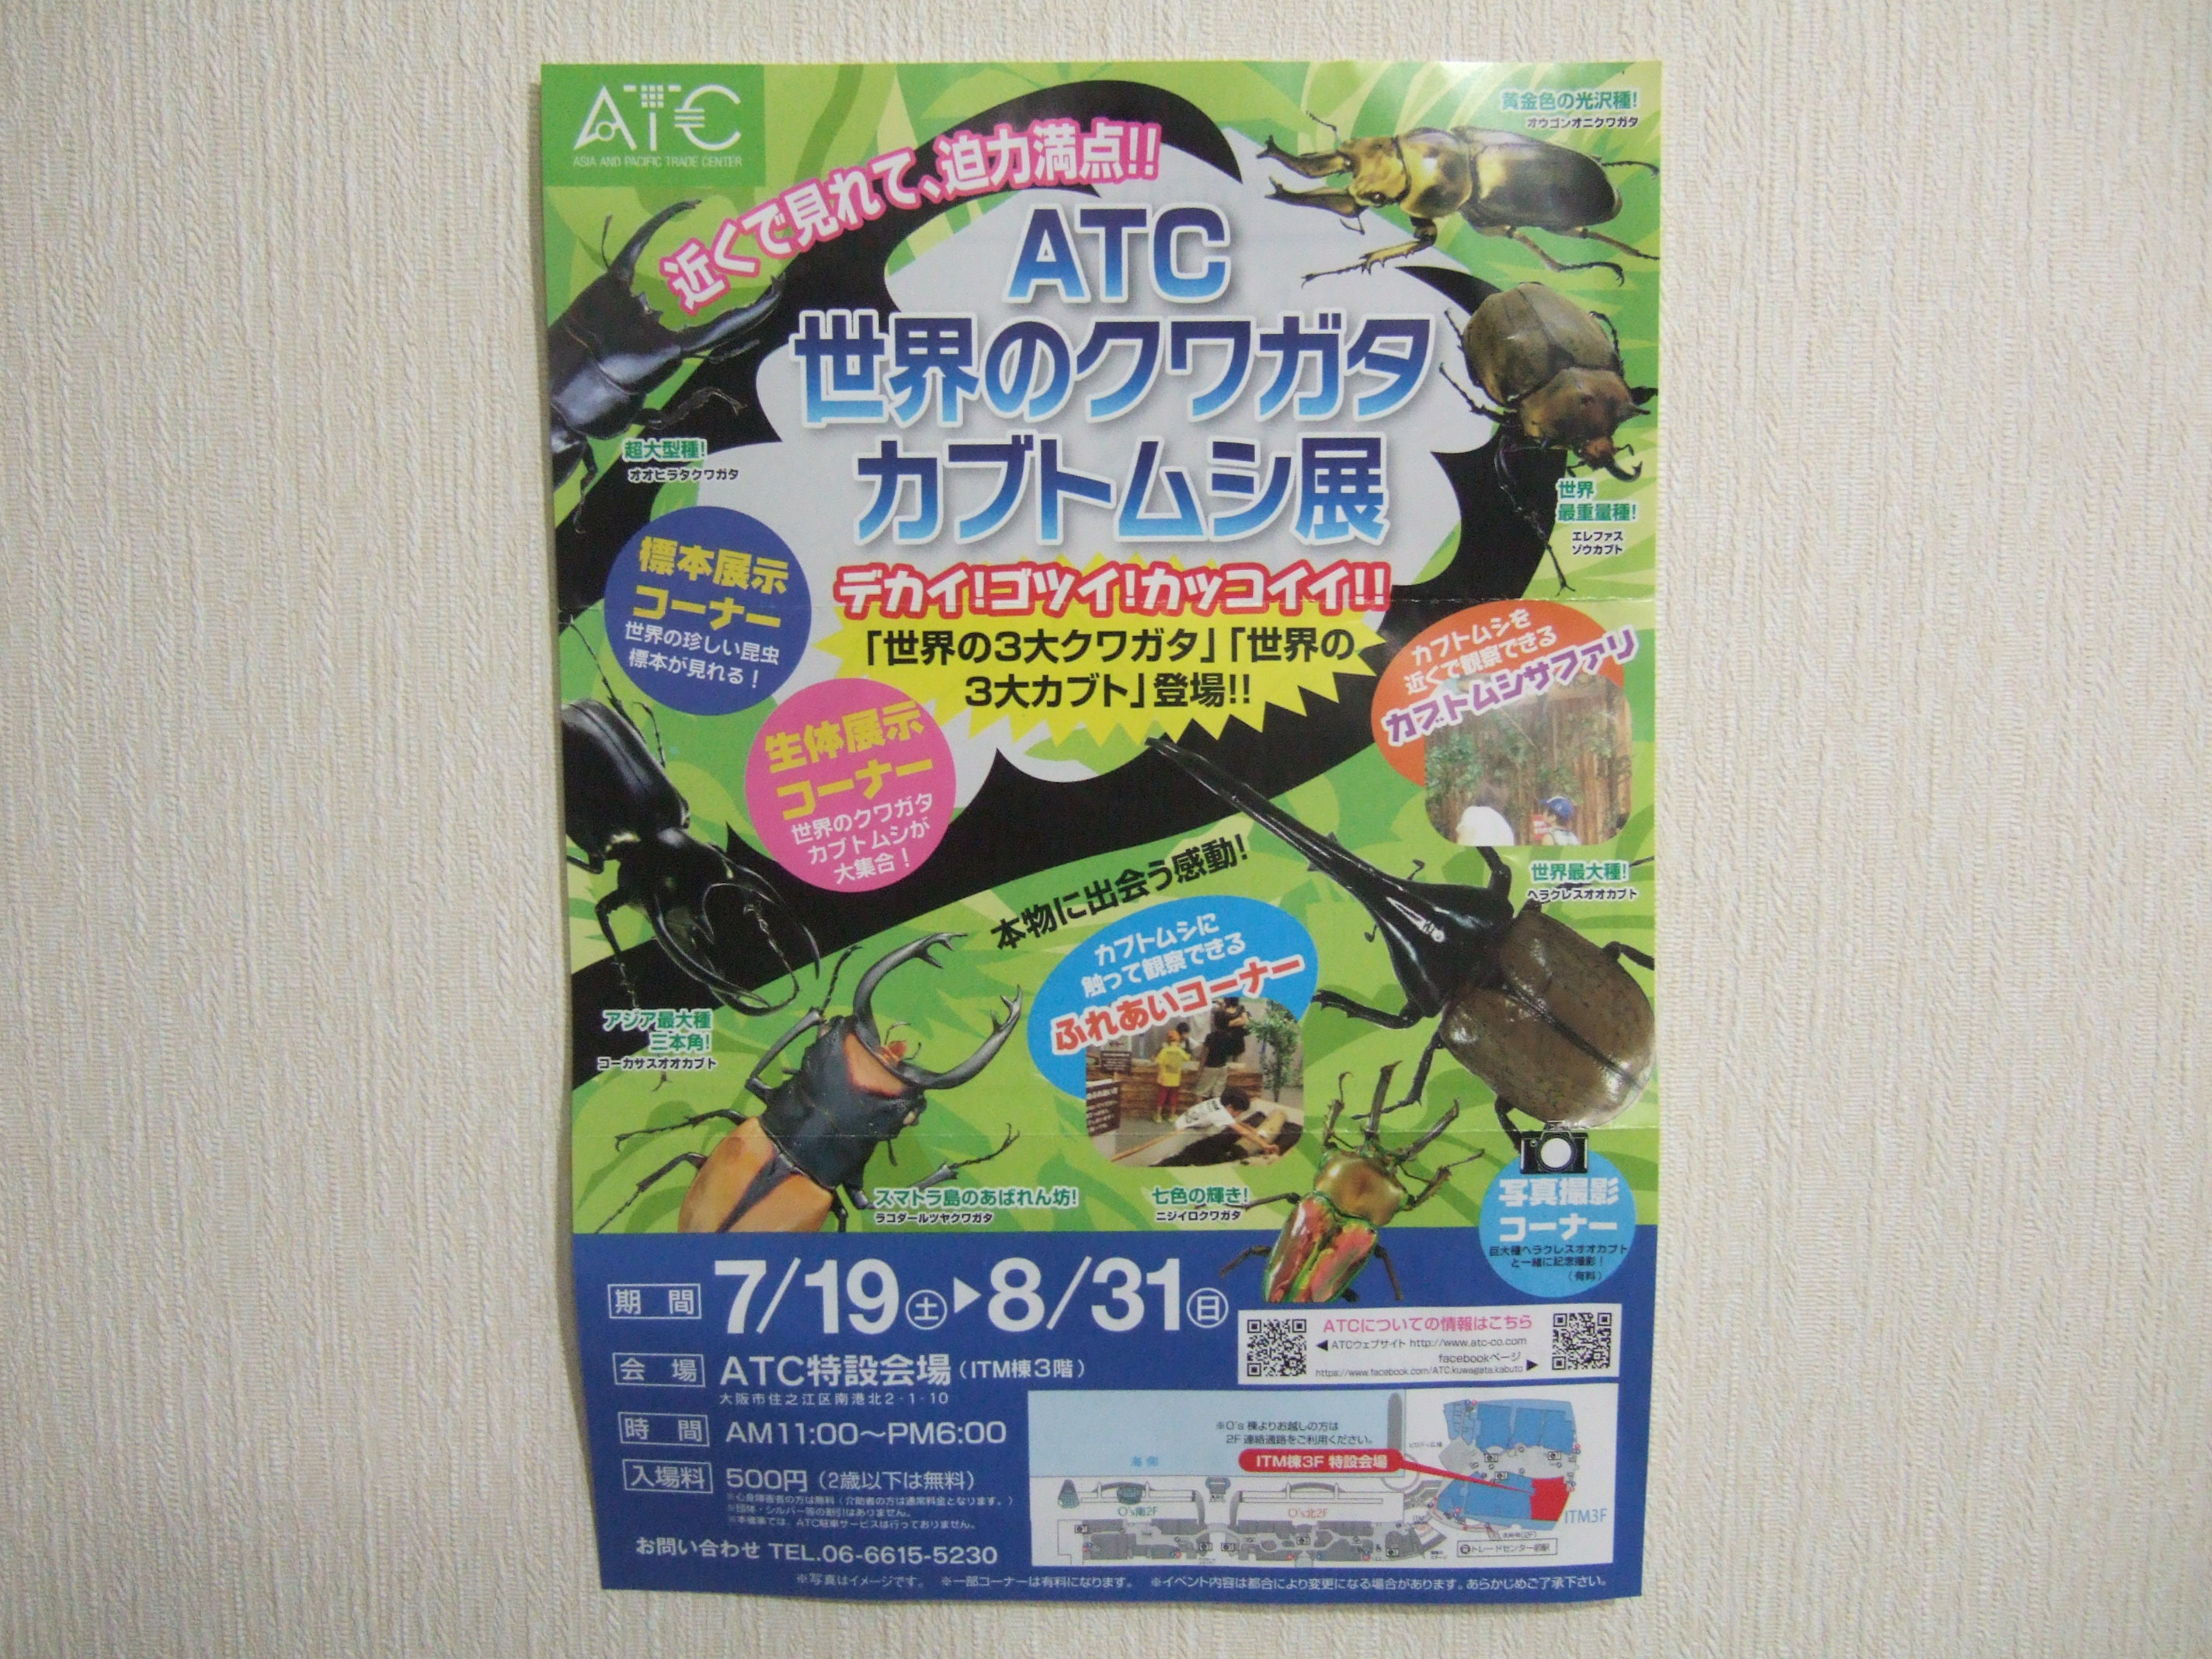 ATC世界のクワガタカブトムシ展2014